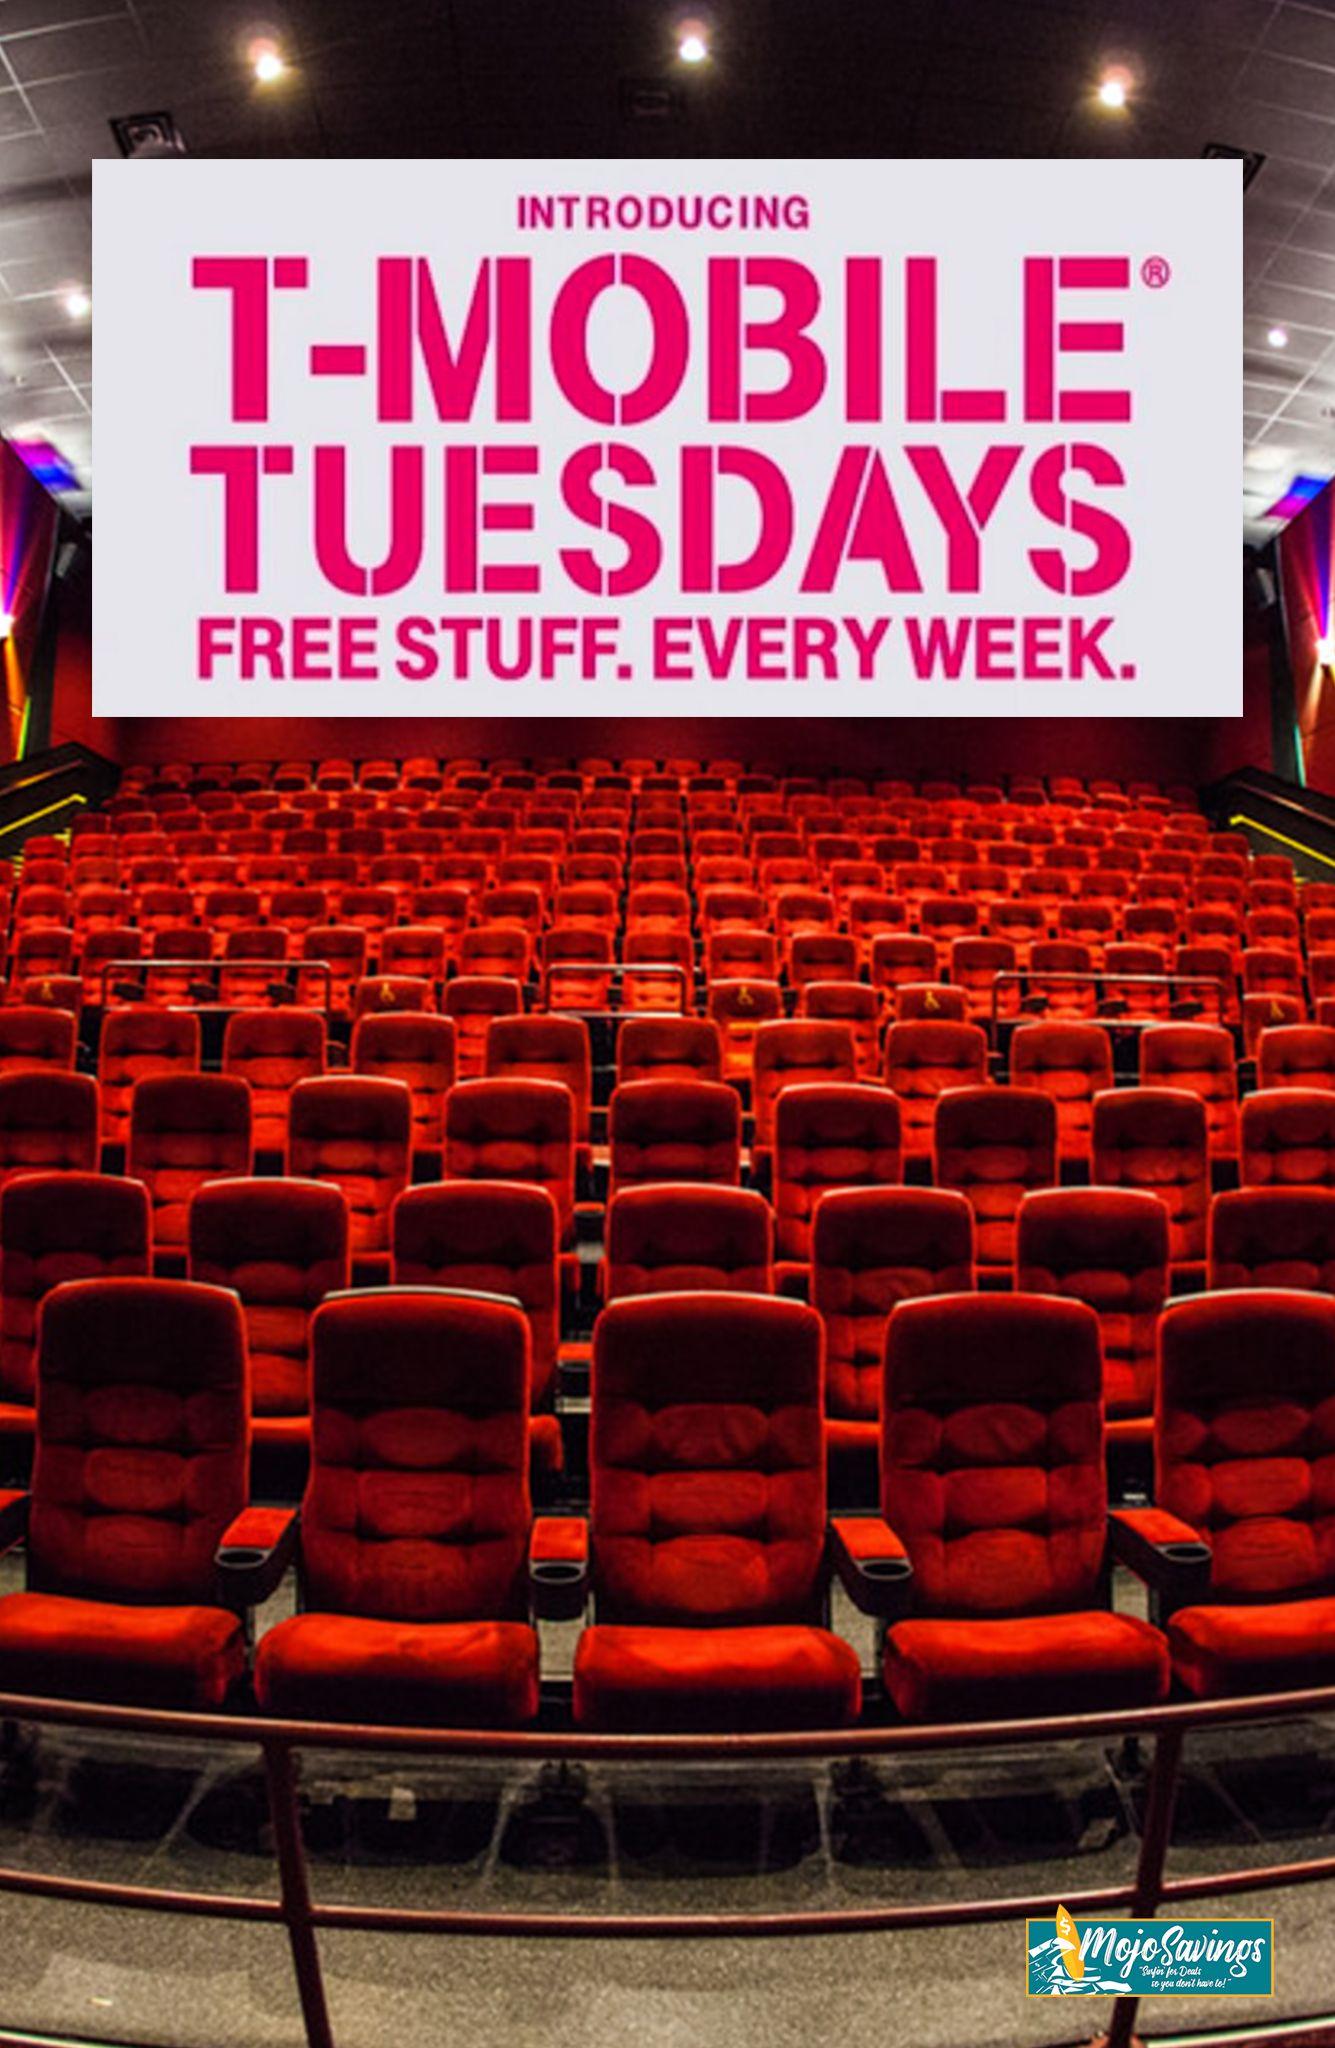 TMobile Tuesdays FREE Movie Rentals, Movie Tickets